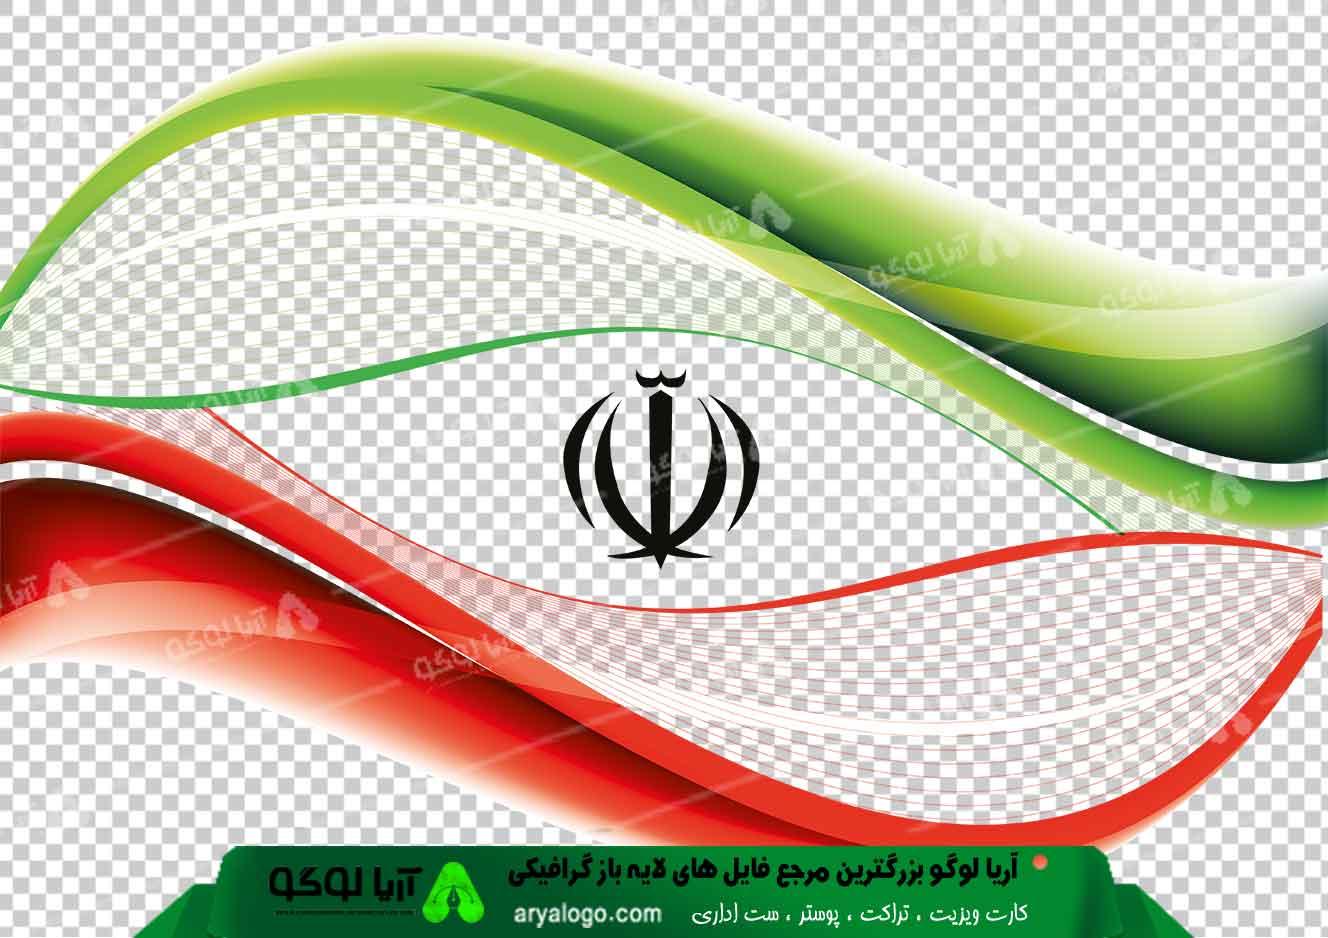 وکتور png پرچم ایران 12